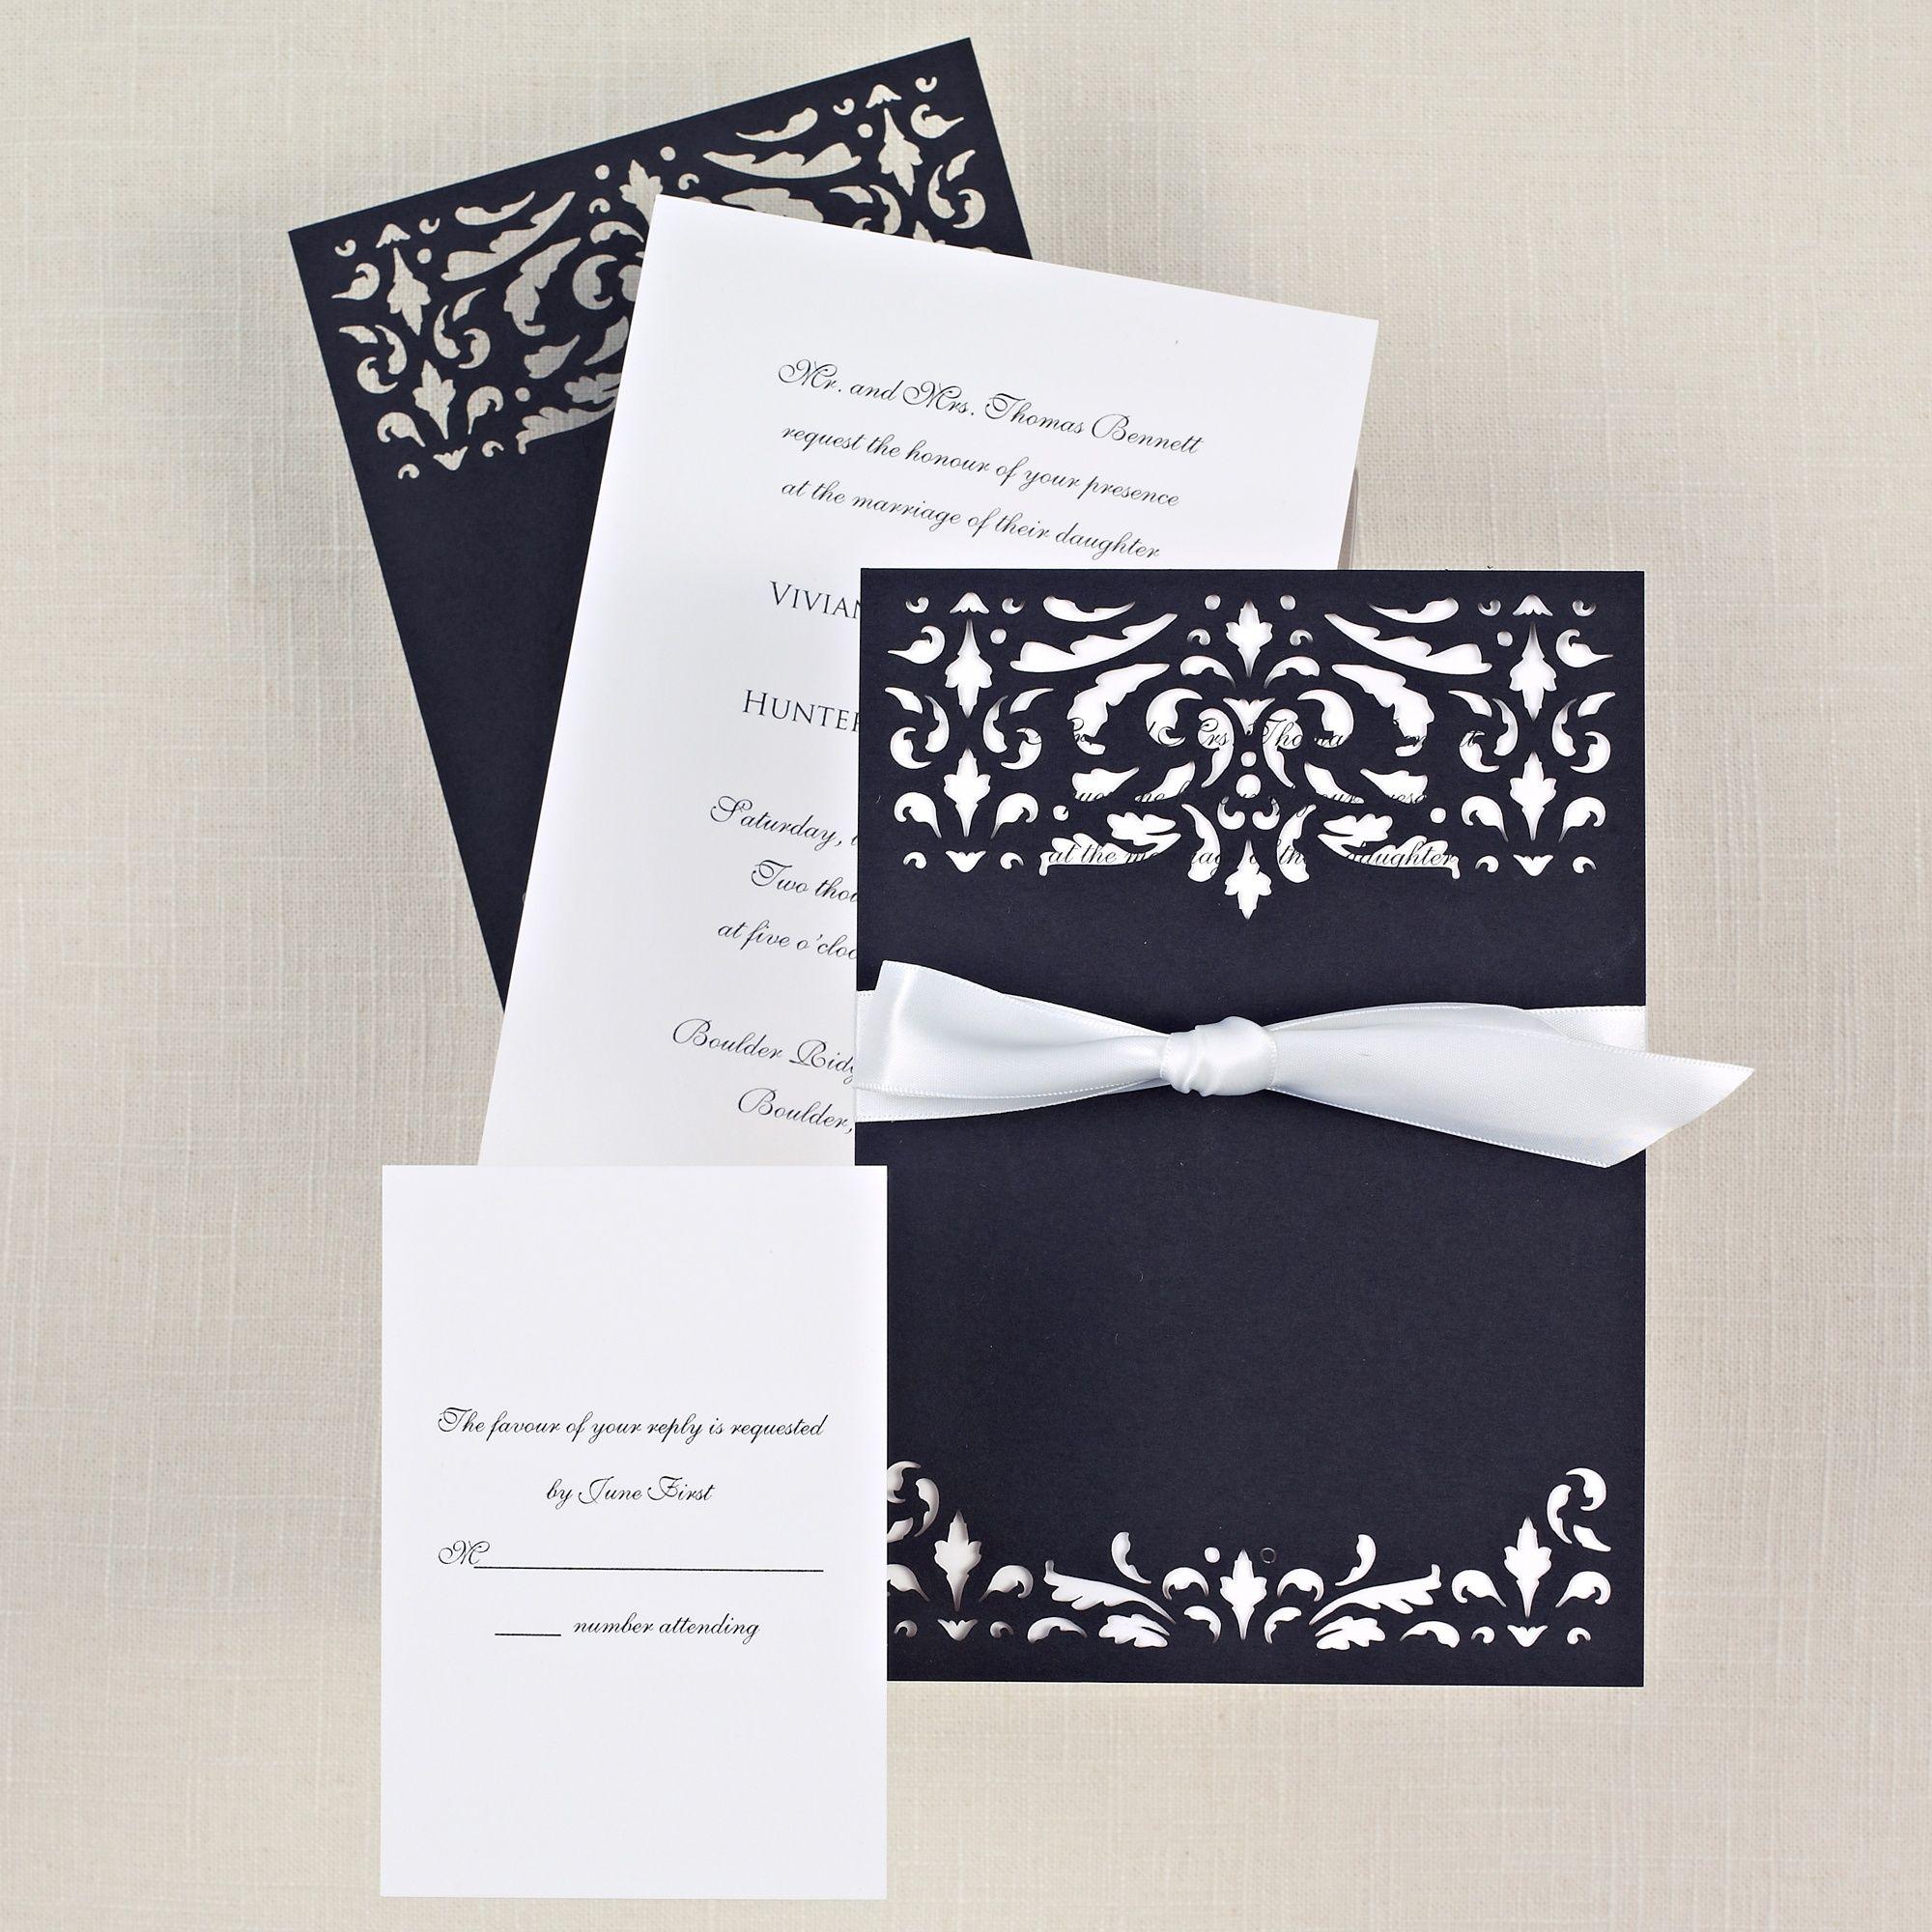 Midnight Romance Wedding Invitation | Laser cut details, black and ...